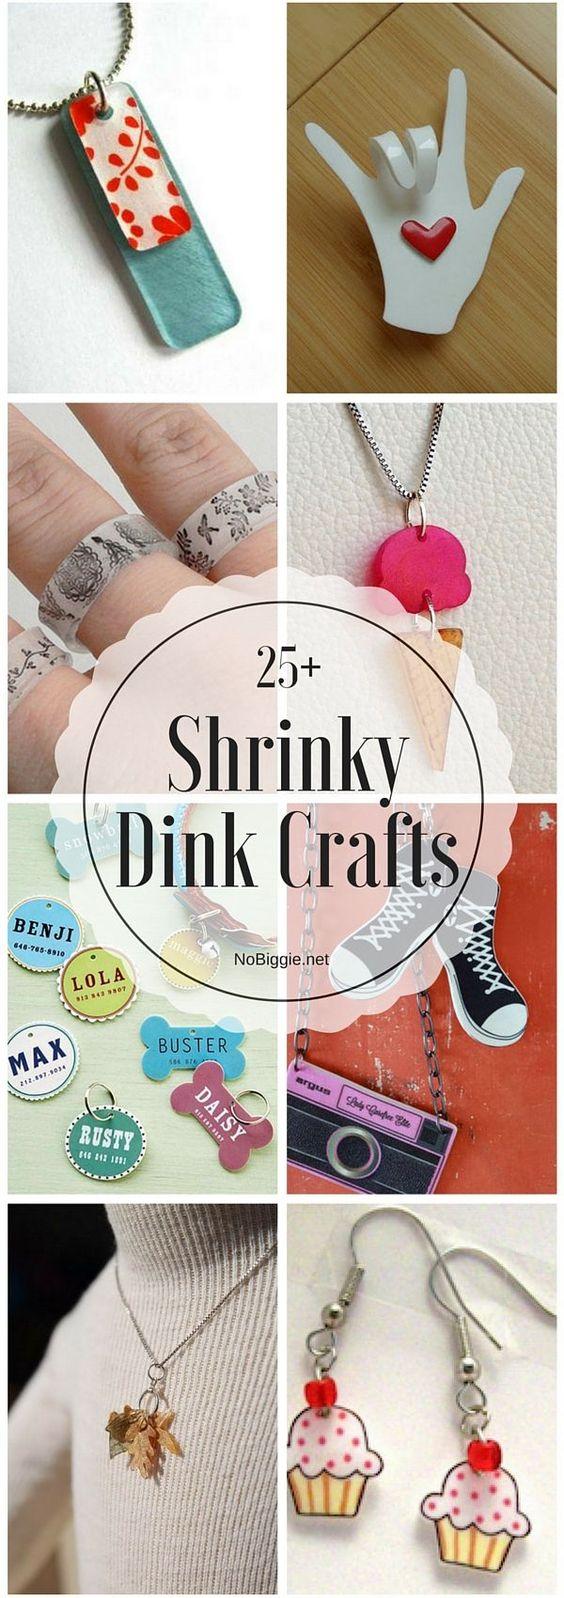 25+ Shrinky Dink Crafts | NoBiggie.net